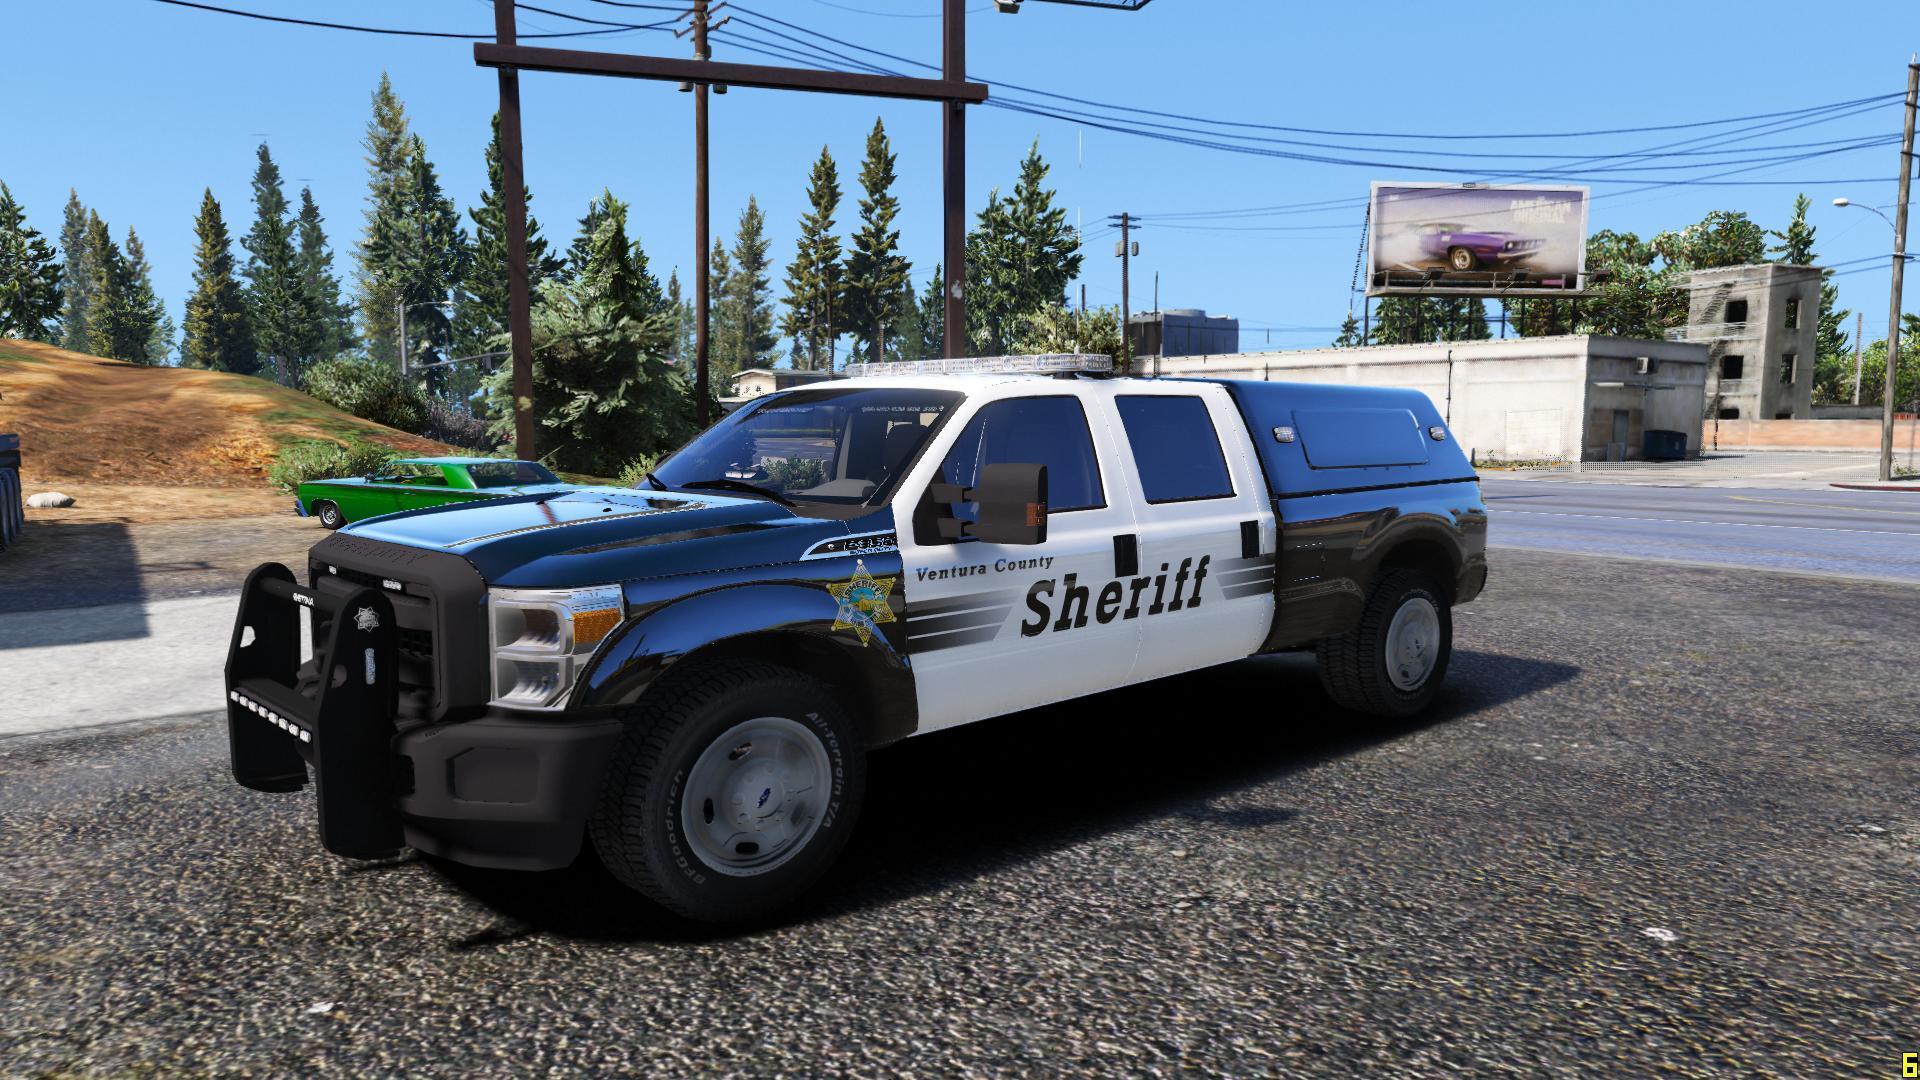 ventura county sheriff 39 s office ford f 350 super duty. Black Bedroom Furniture Sets. Home Design Ideas